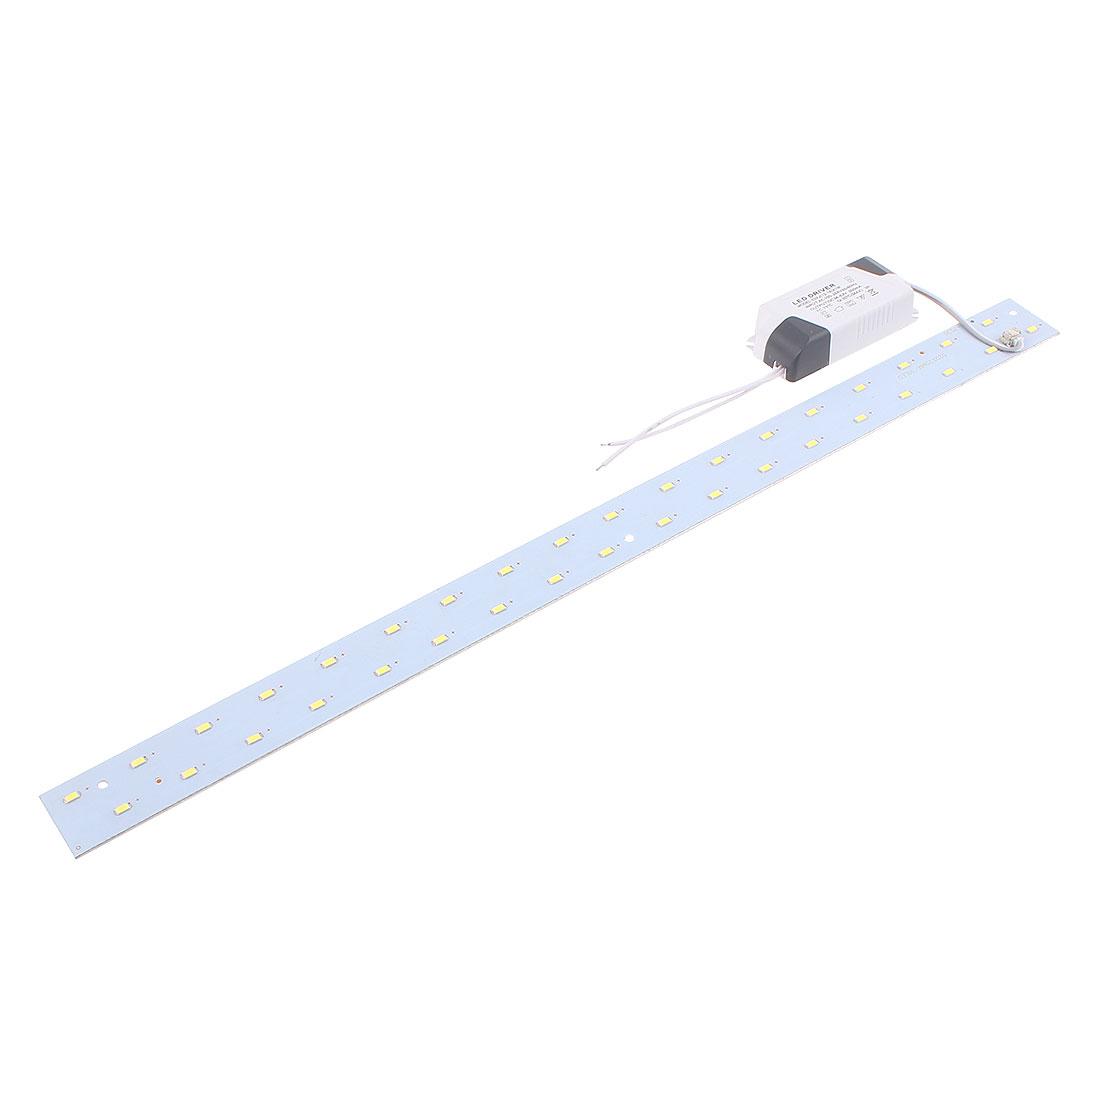 AC100~265V 18W LED Ceiling light Panel Long Strip Retrofit Plate Pure White 52cm